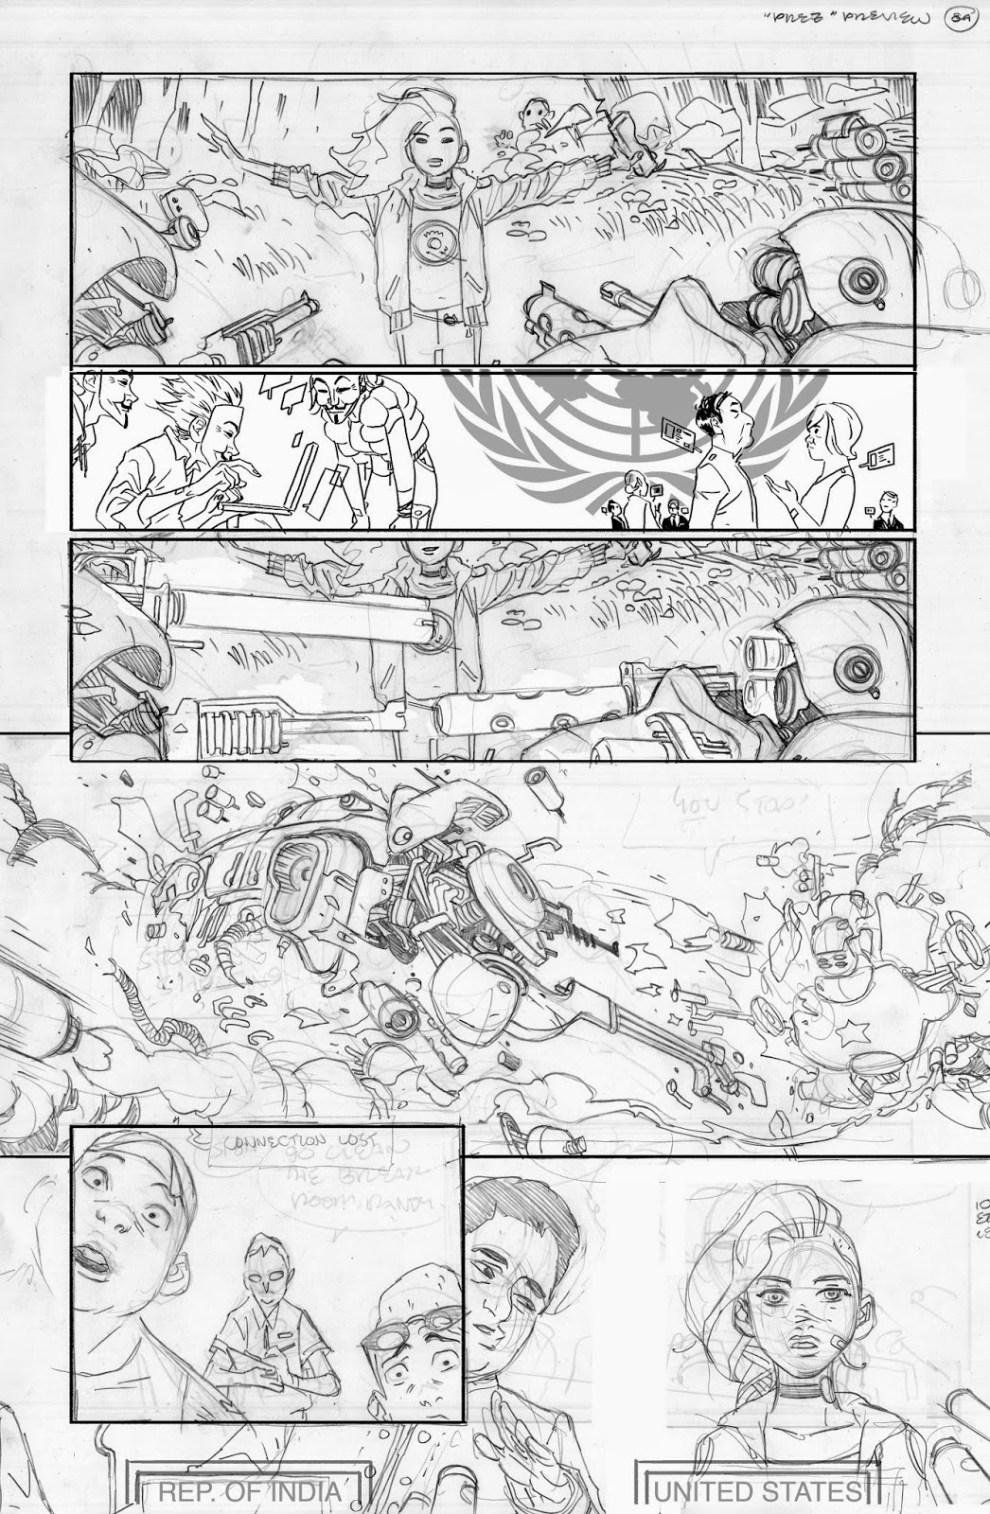 PREZ pencils by Ben Caldwell